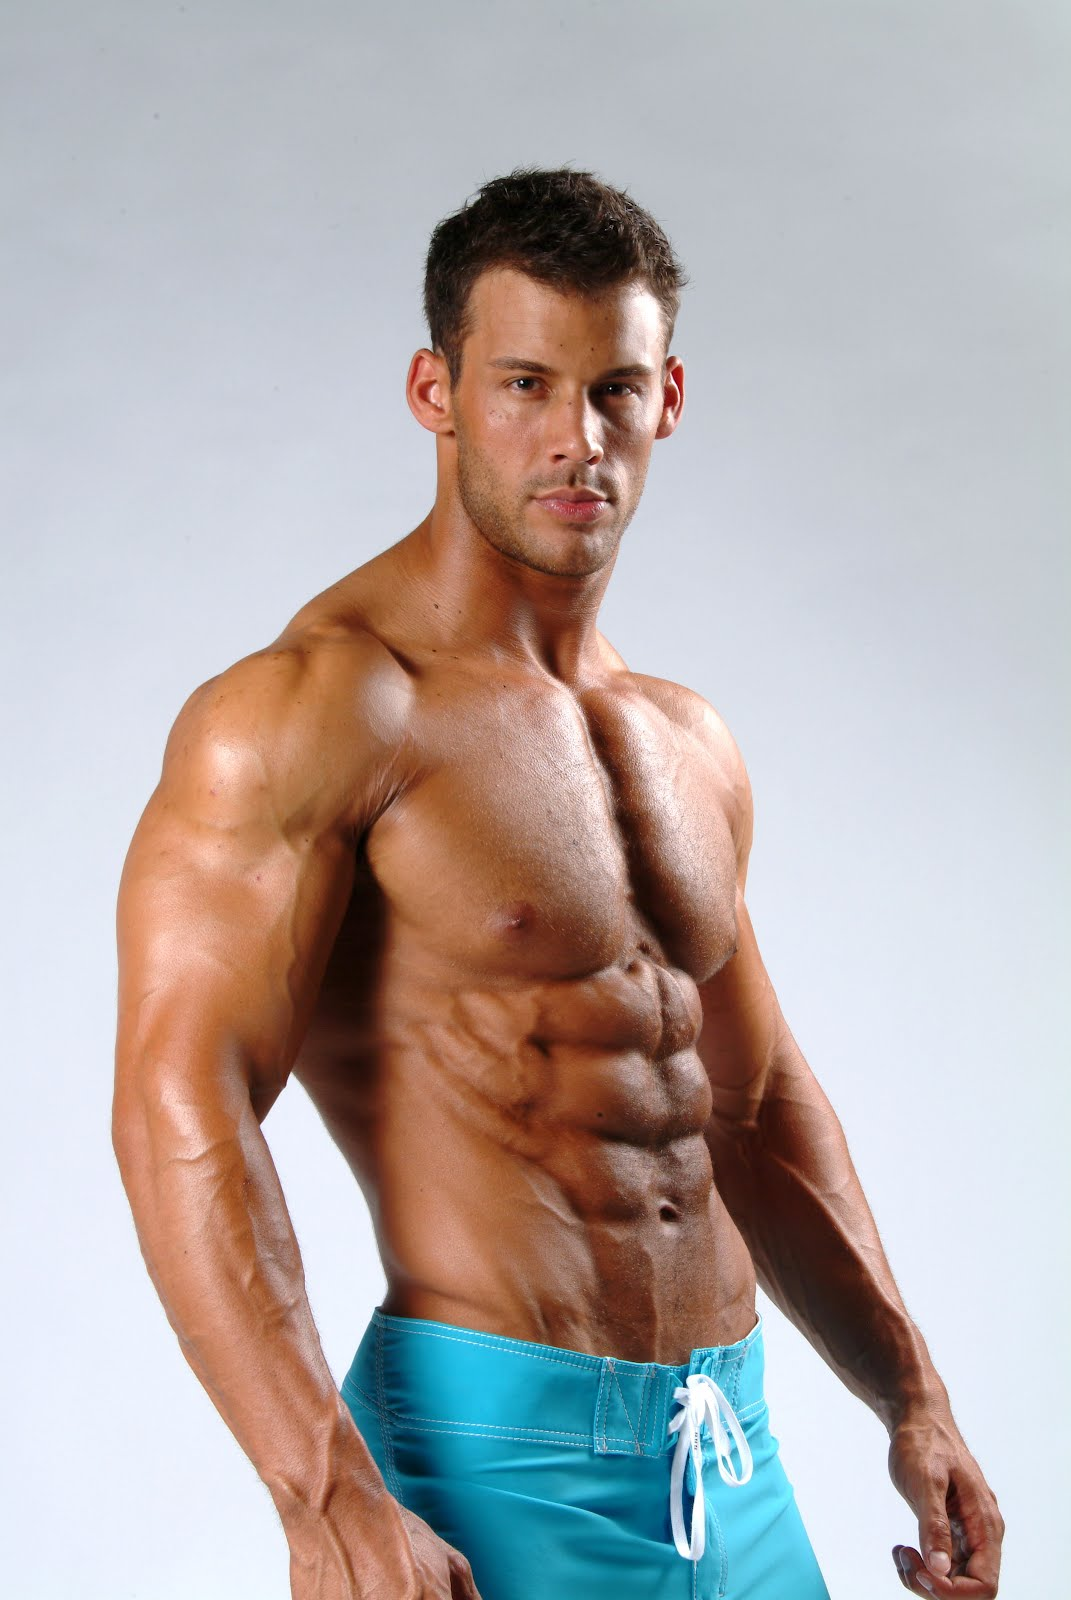 Gay Muscle Builder 55